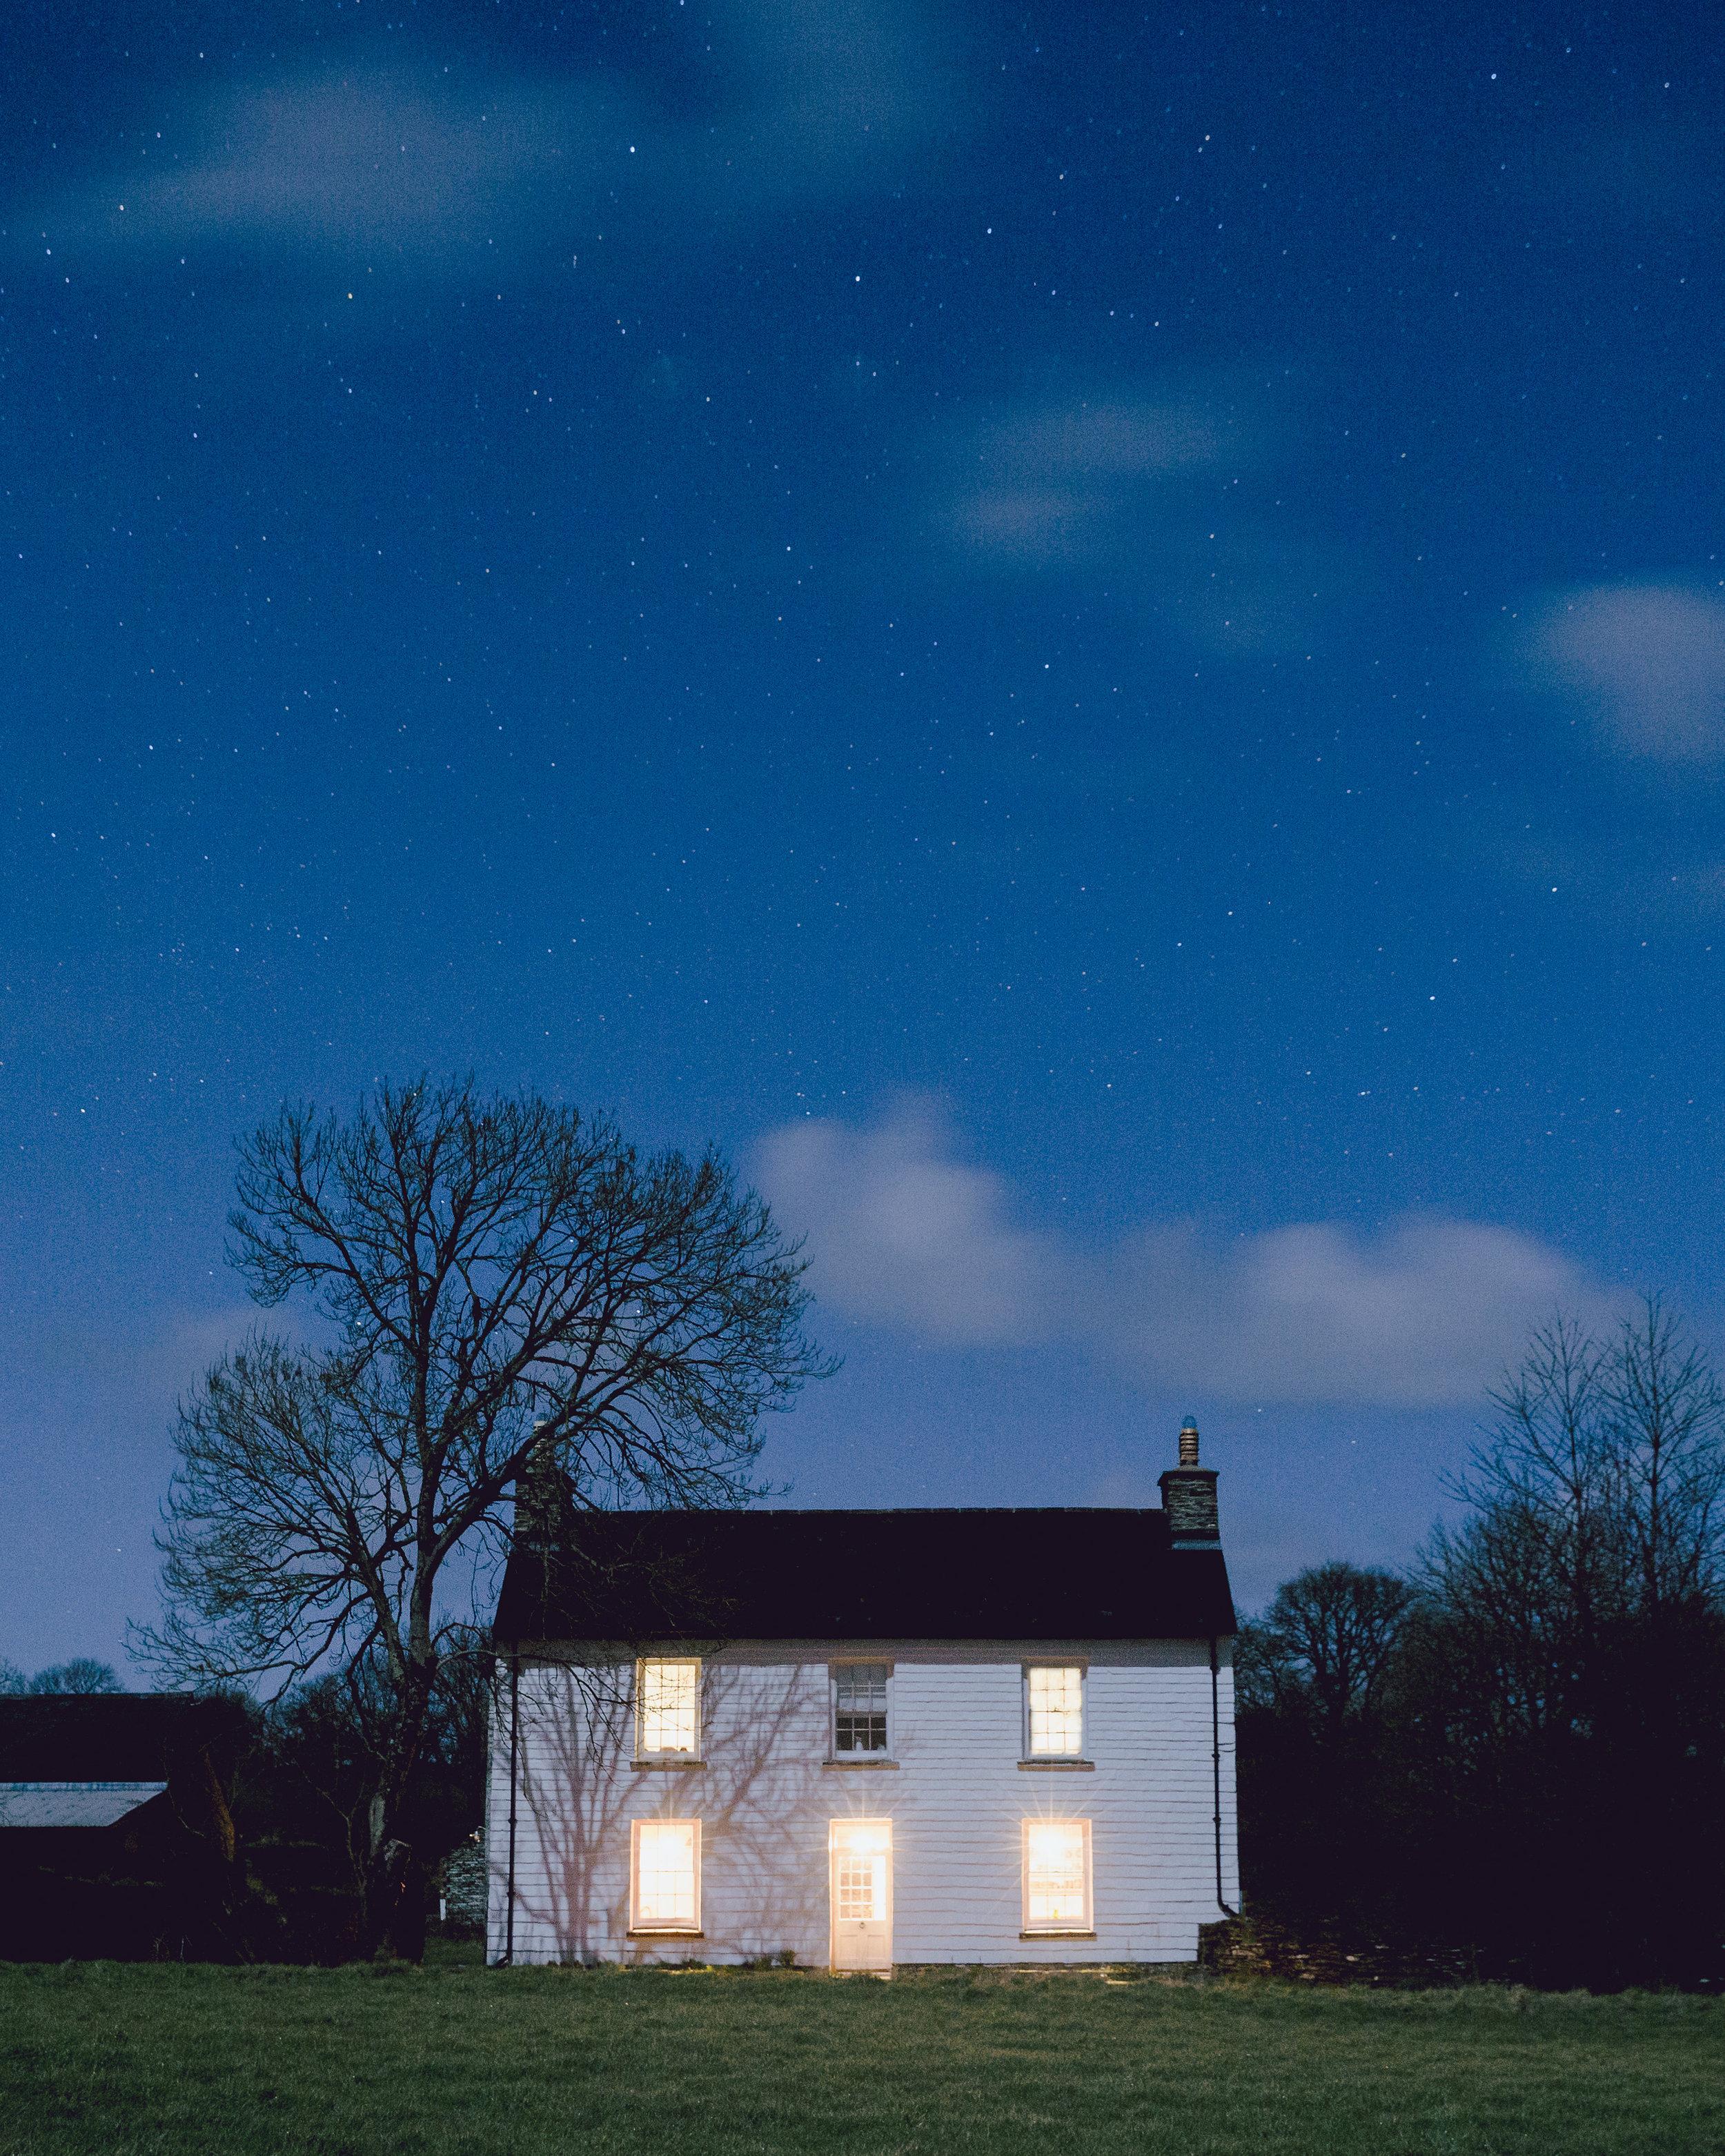 Fforest-Farmhouse-Finn_Beales.jpg